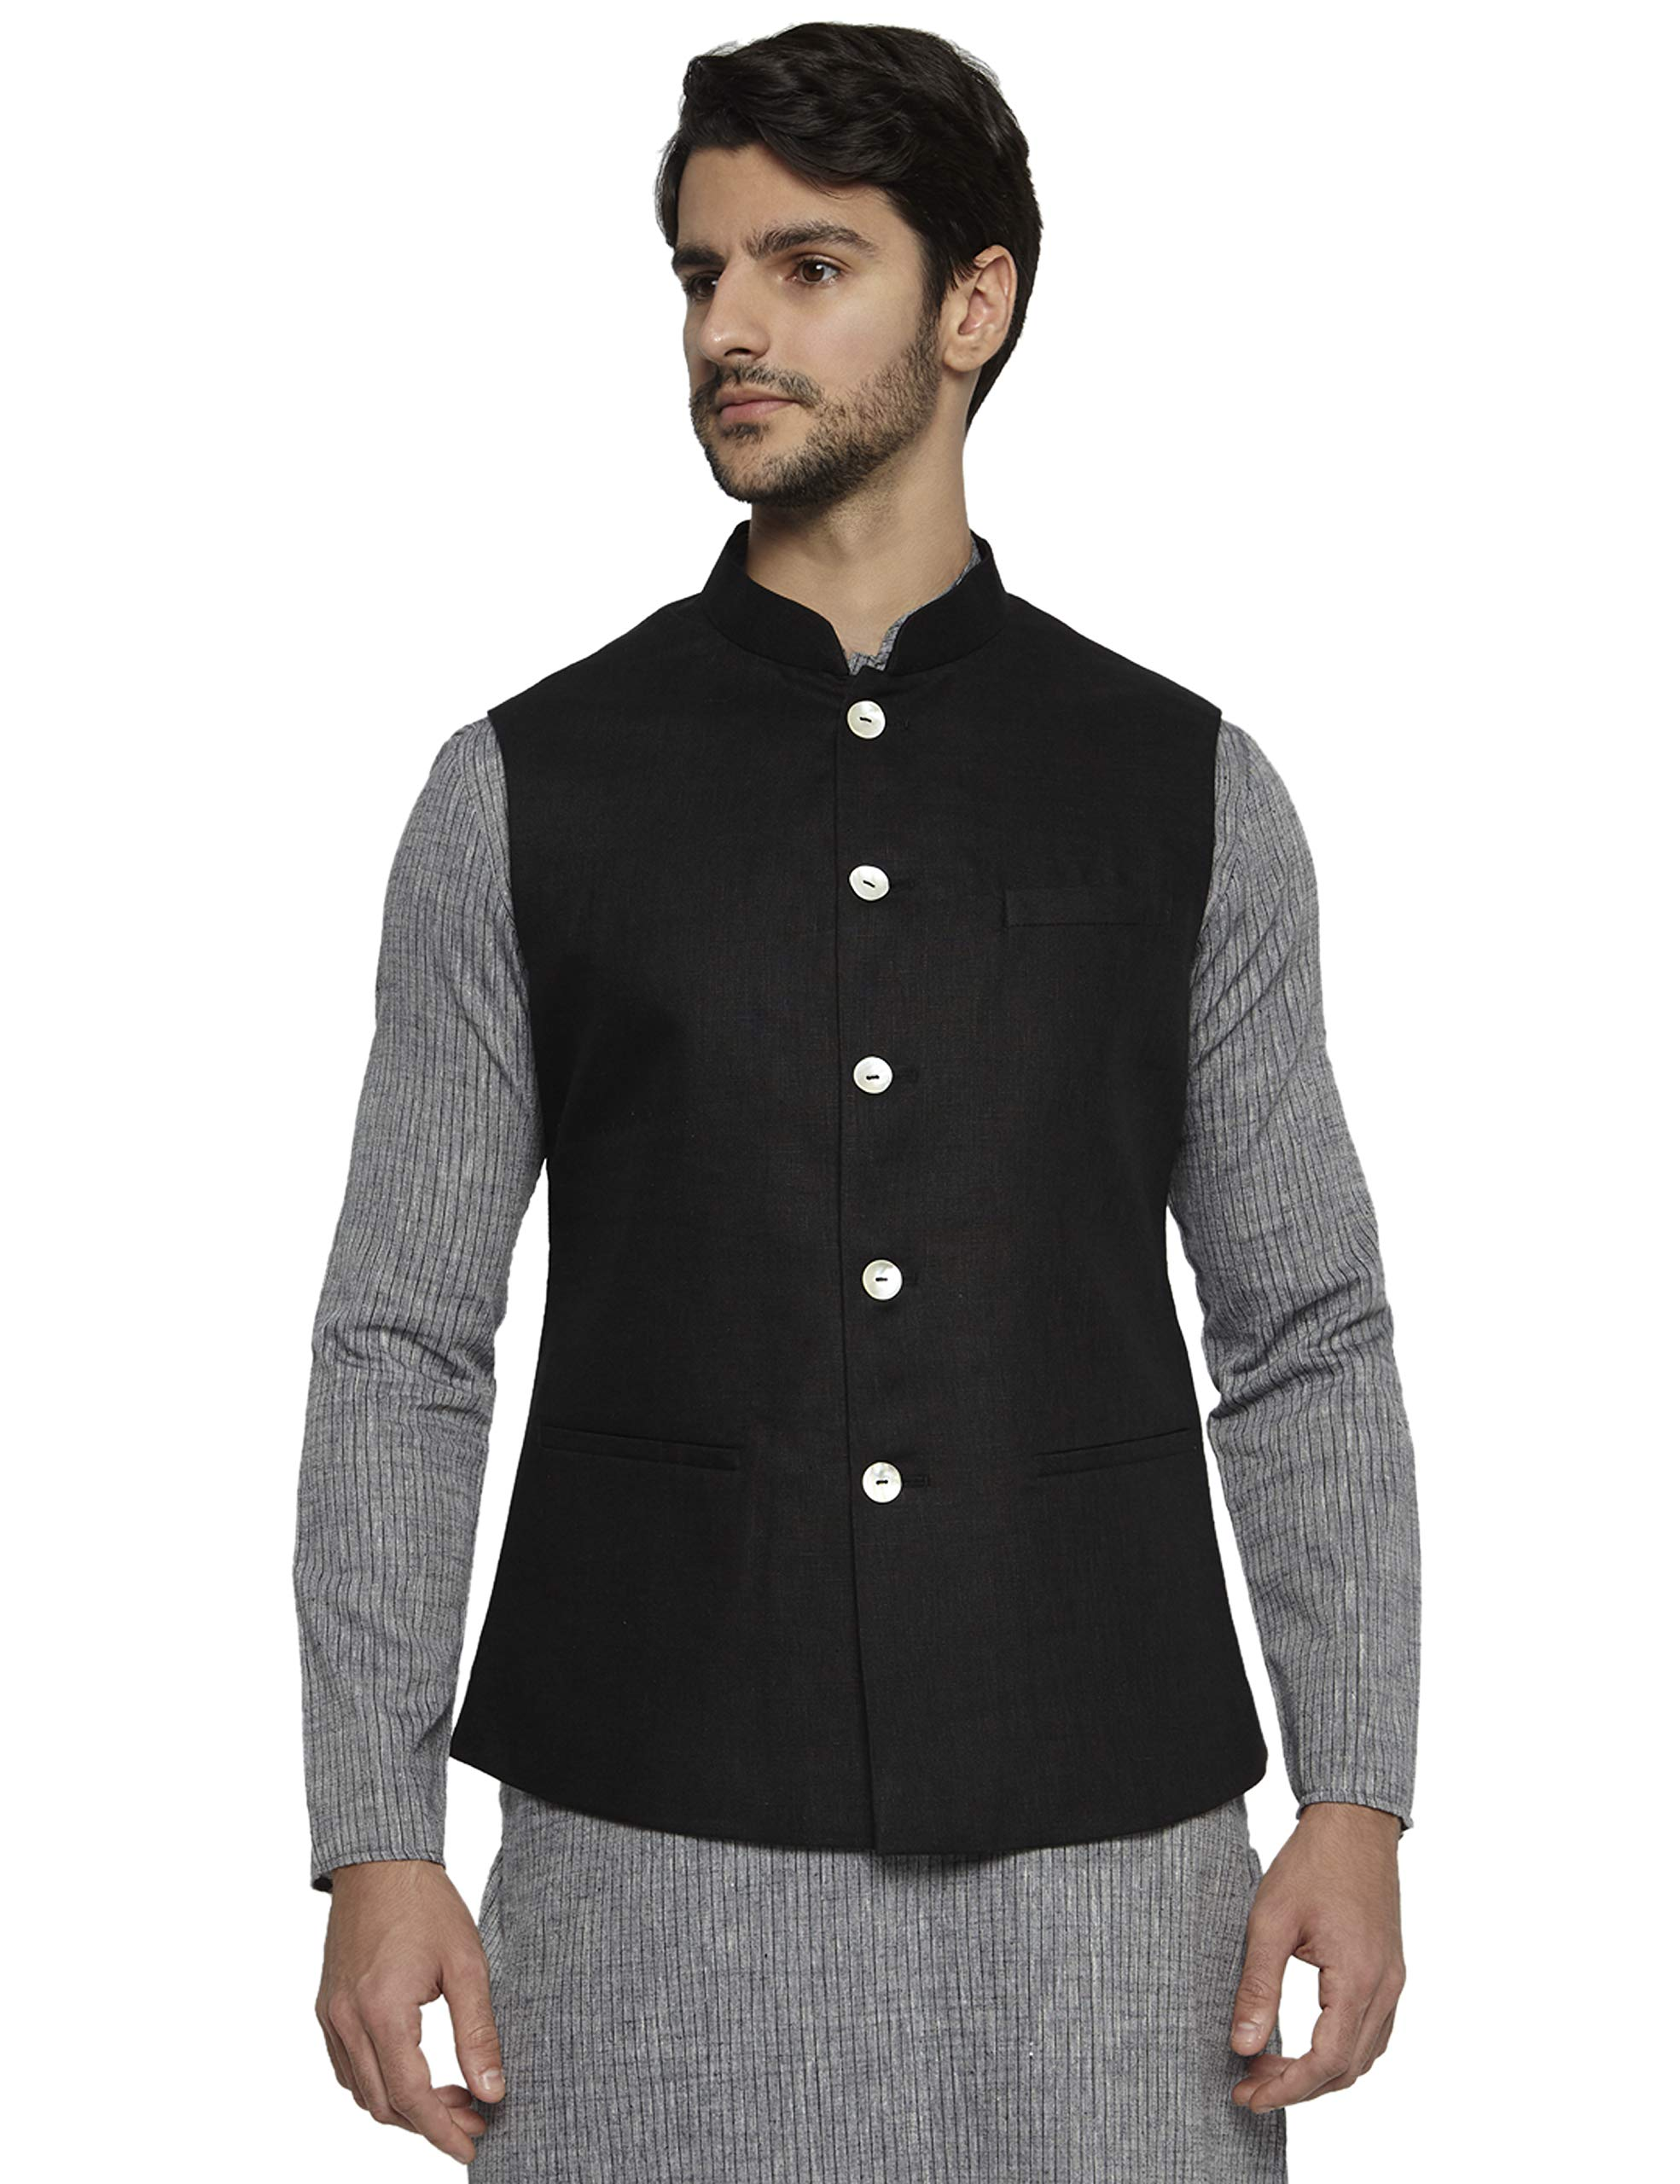 Ethnix by Raymond Men's Black Linen Nehru Jacket L